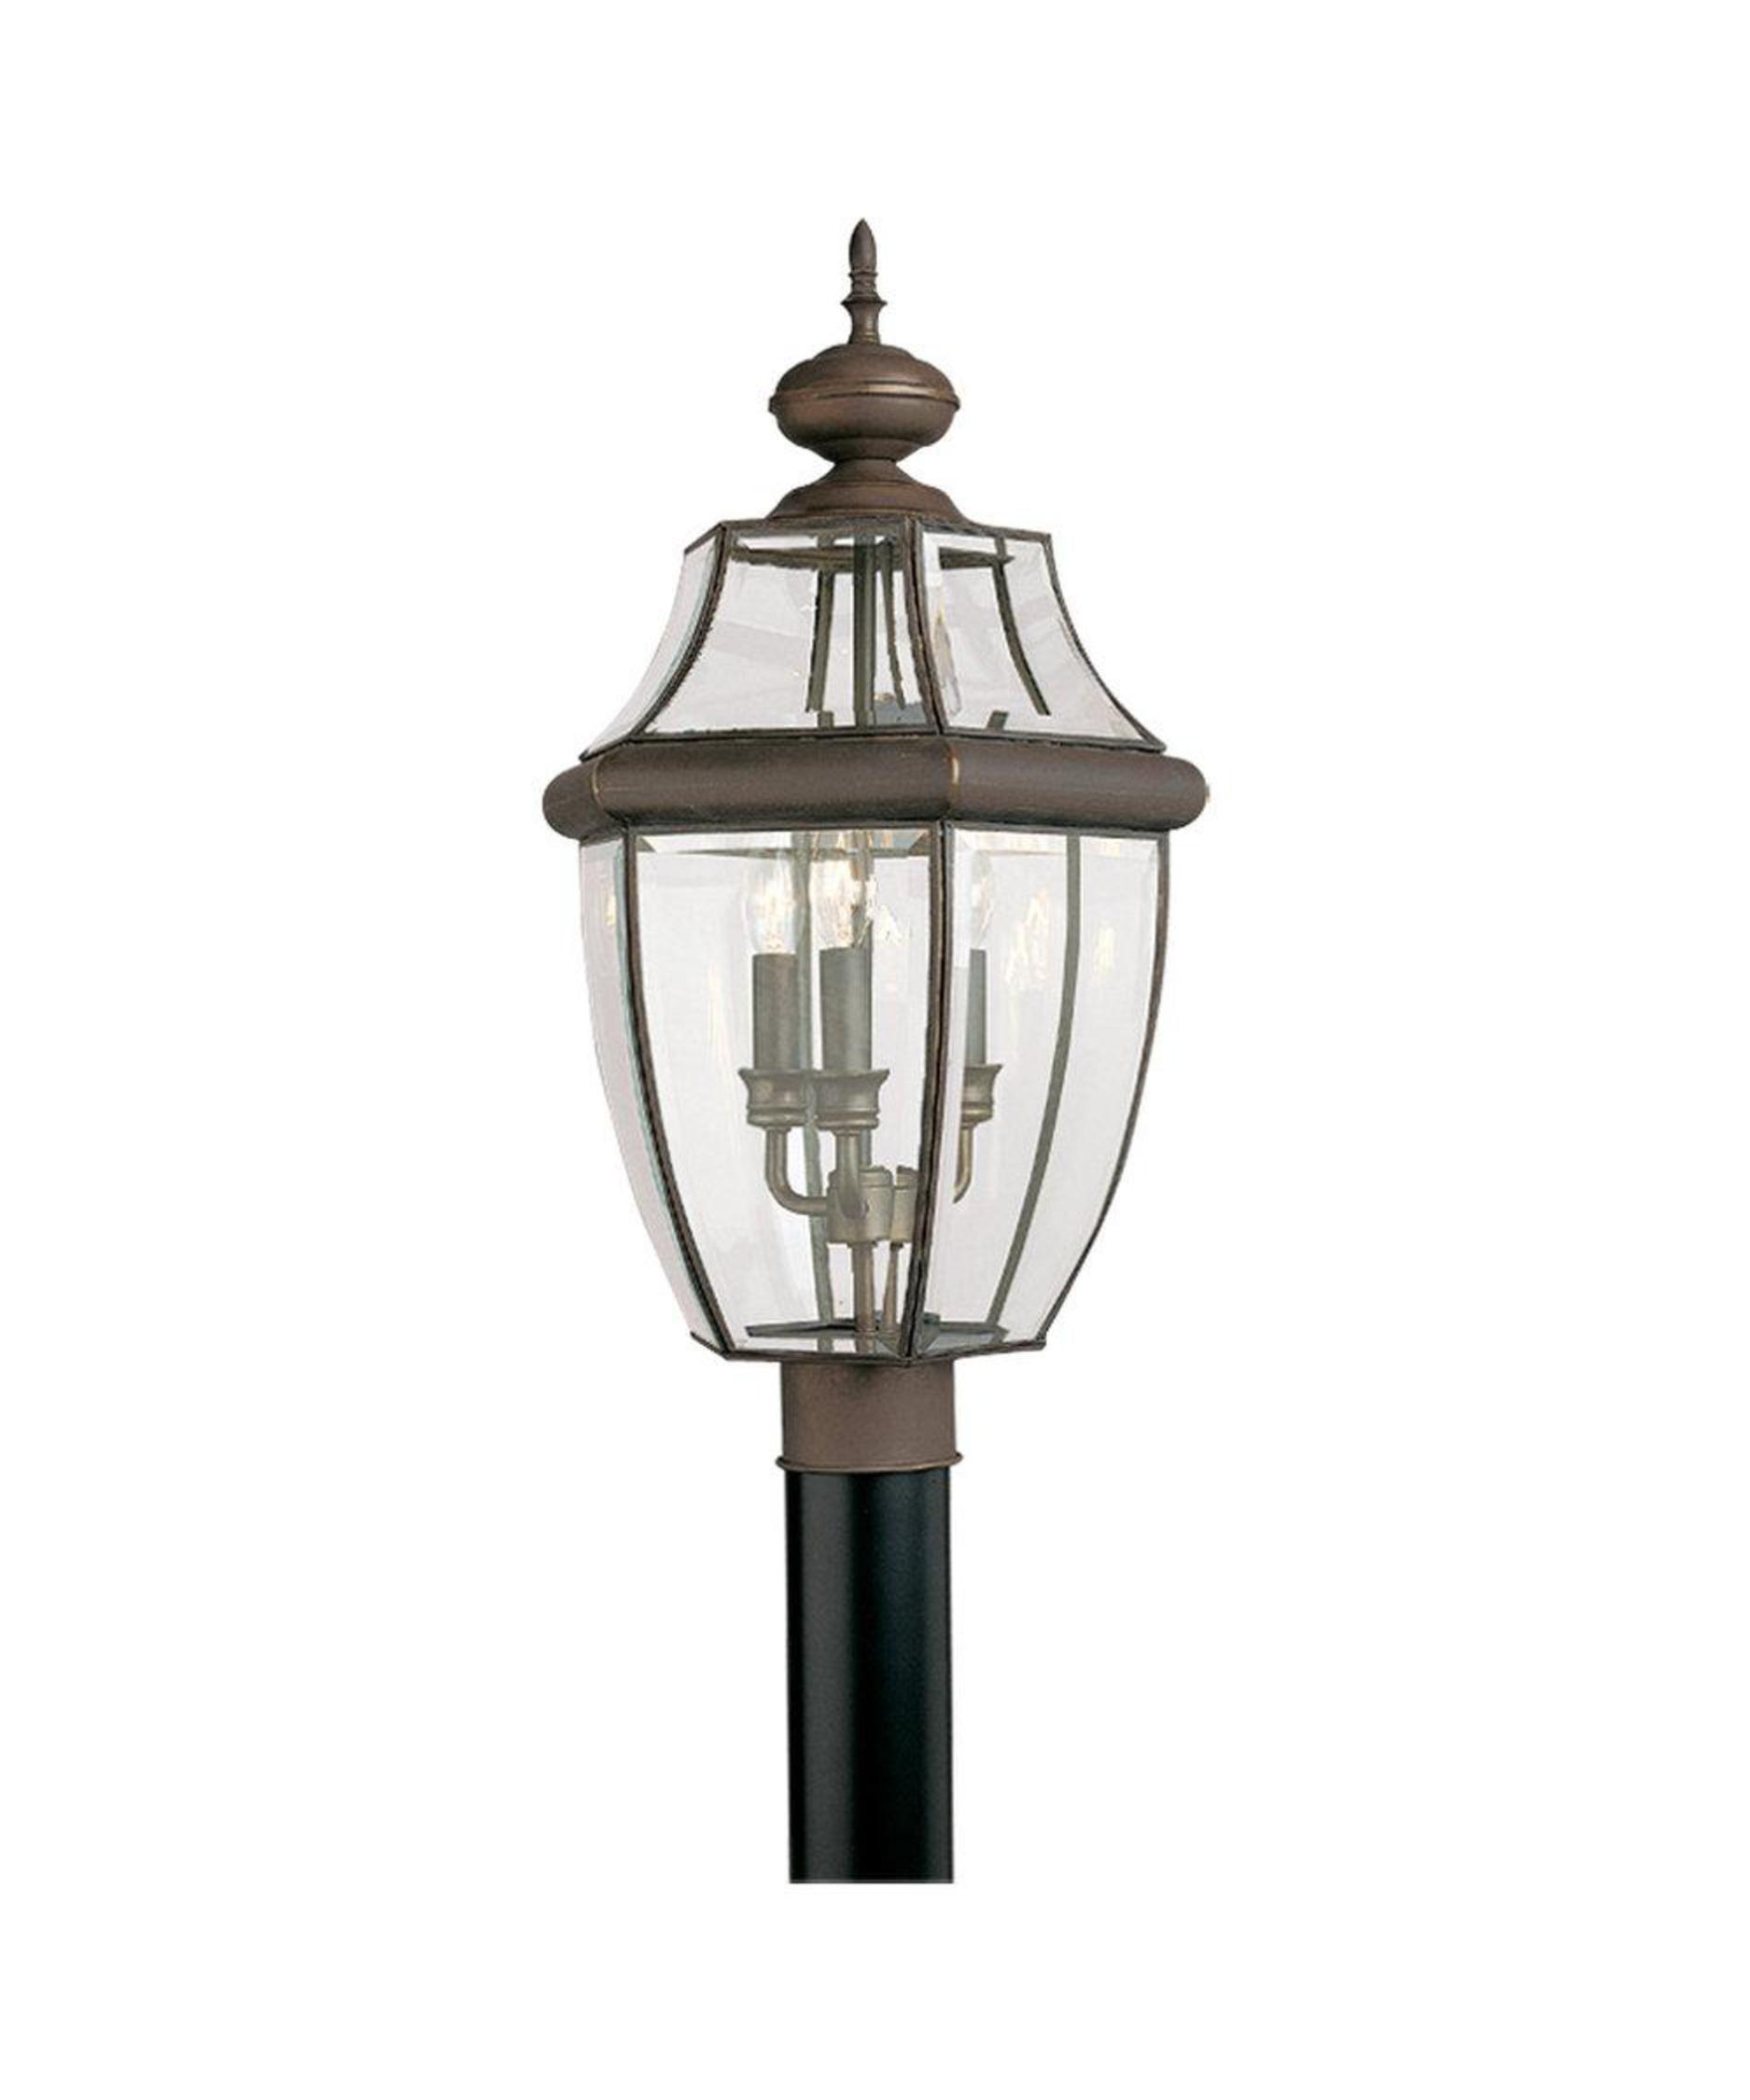 Sea gull lighting 8239 lancaster 3 light outdoor post lamp outdoor sea gull lighting 8239 lancaster 3 light outdoor post lamp aloadofball Gallery